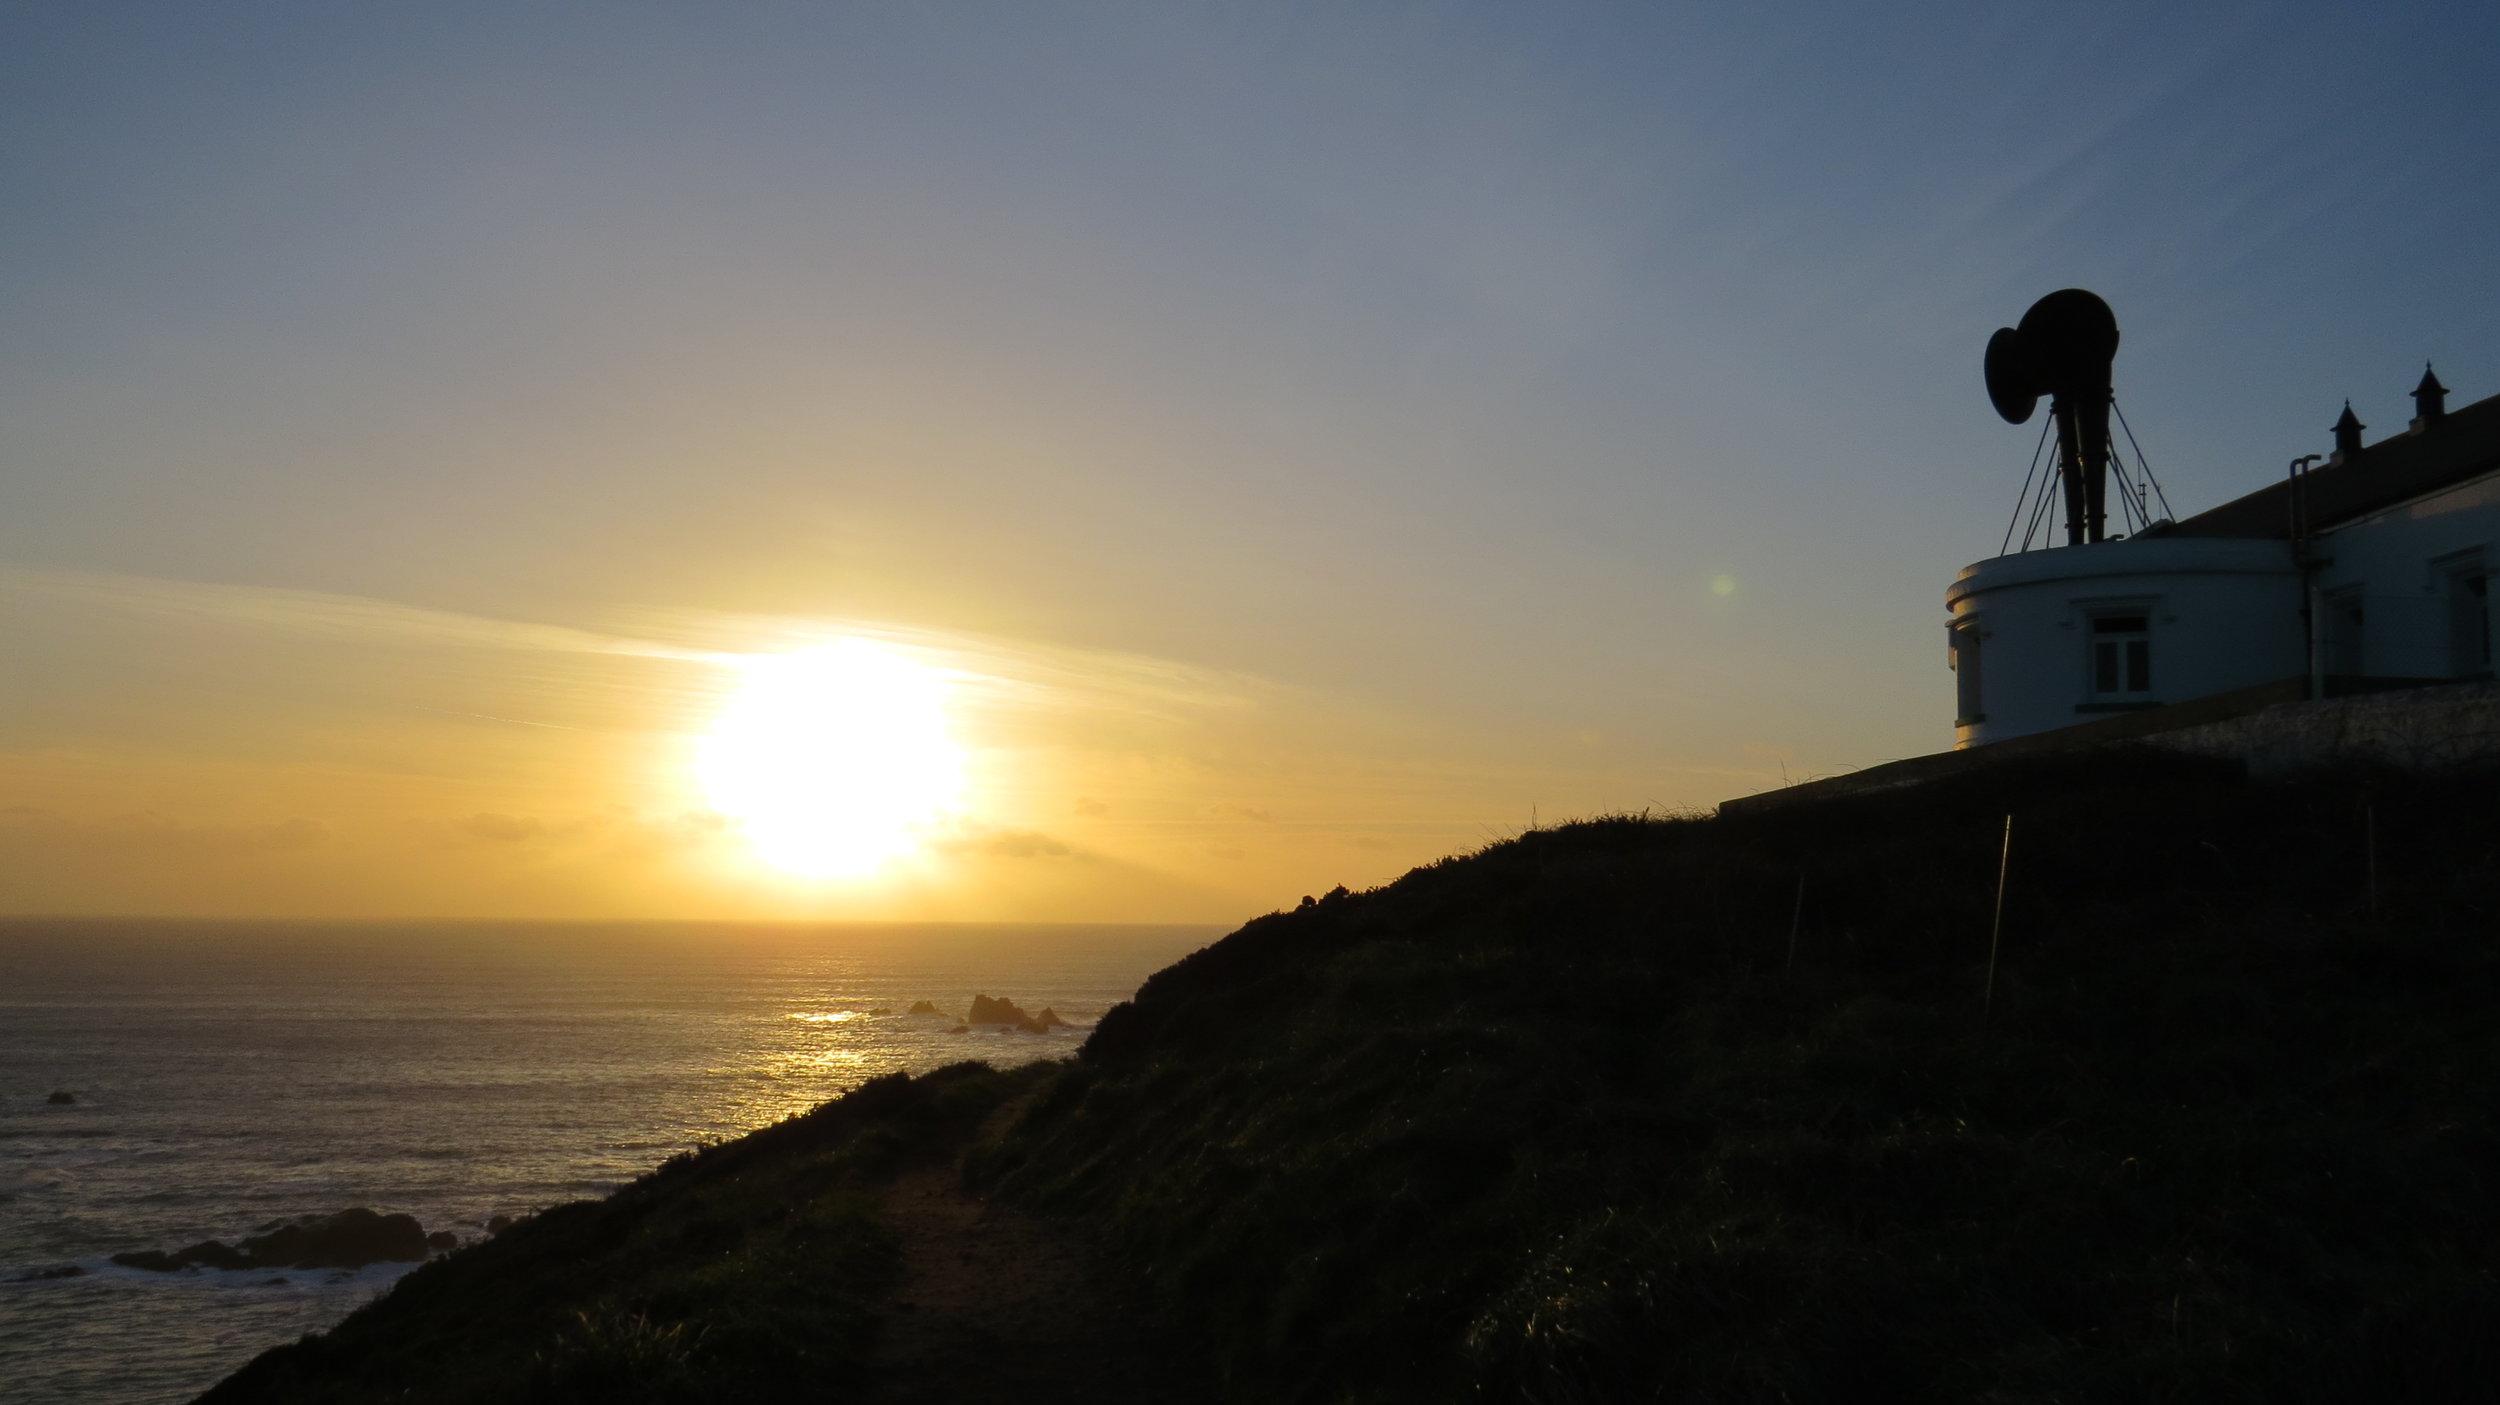 Sunset & Foghorns